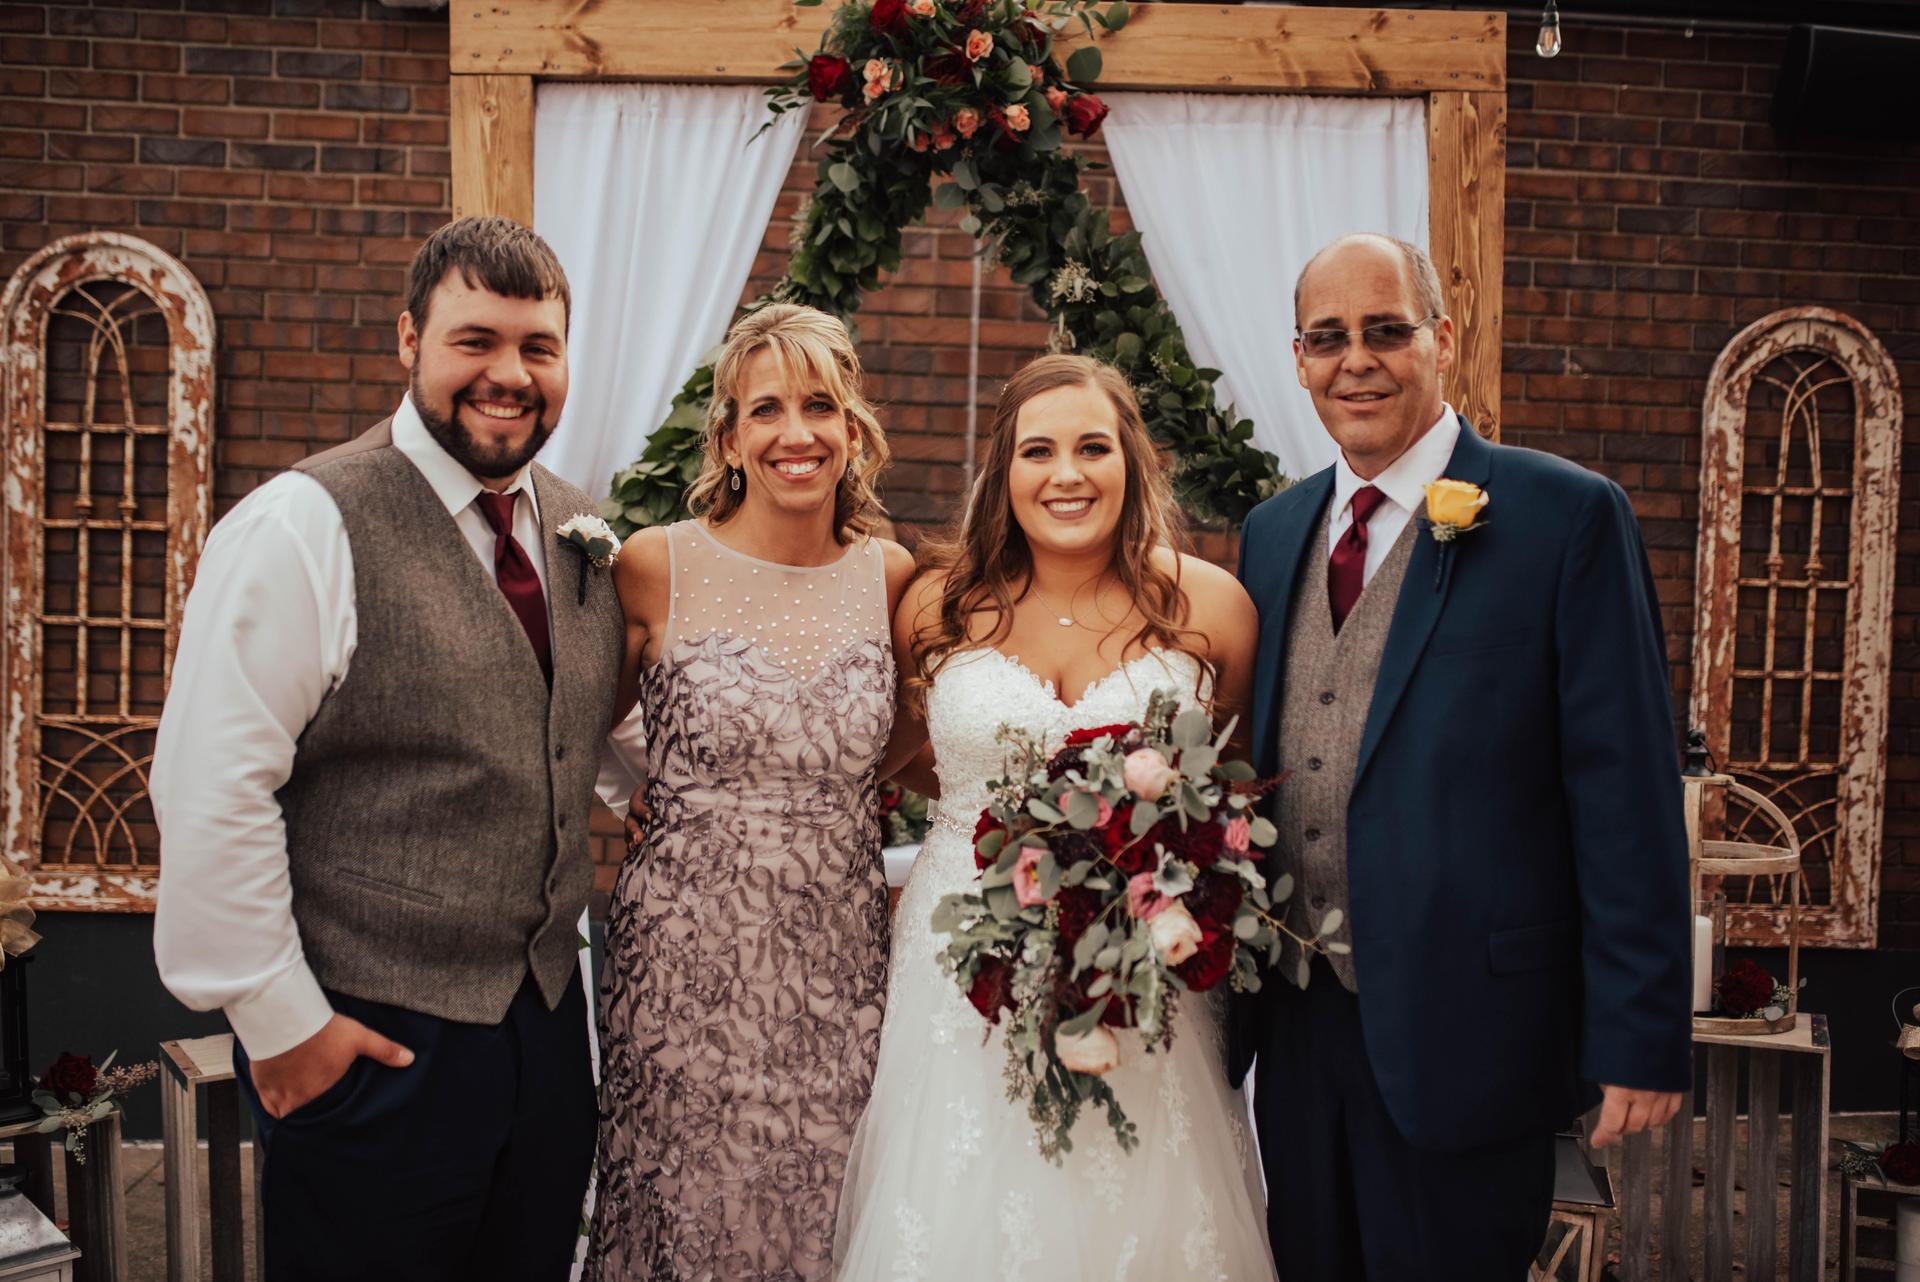 Wedding, Nov. 2019